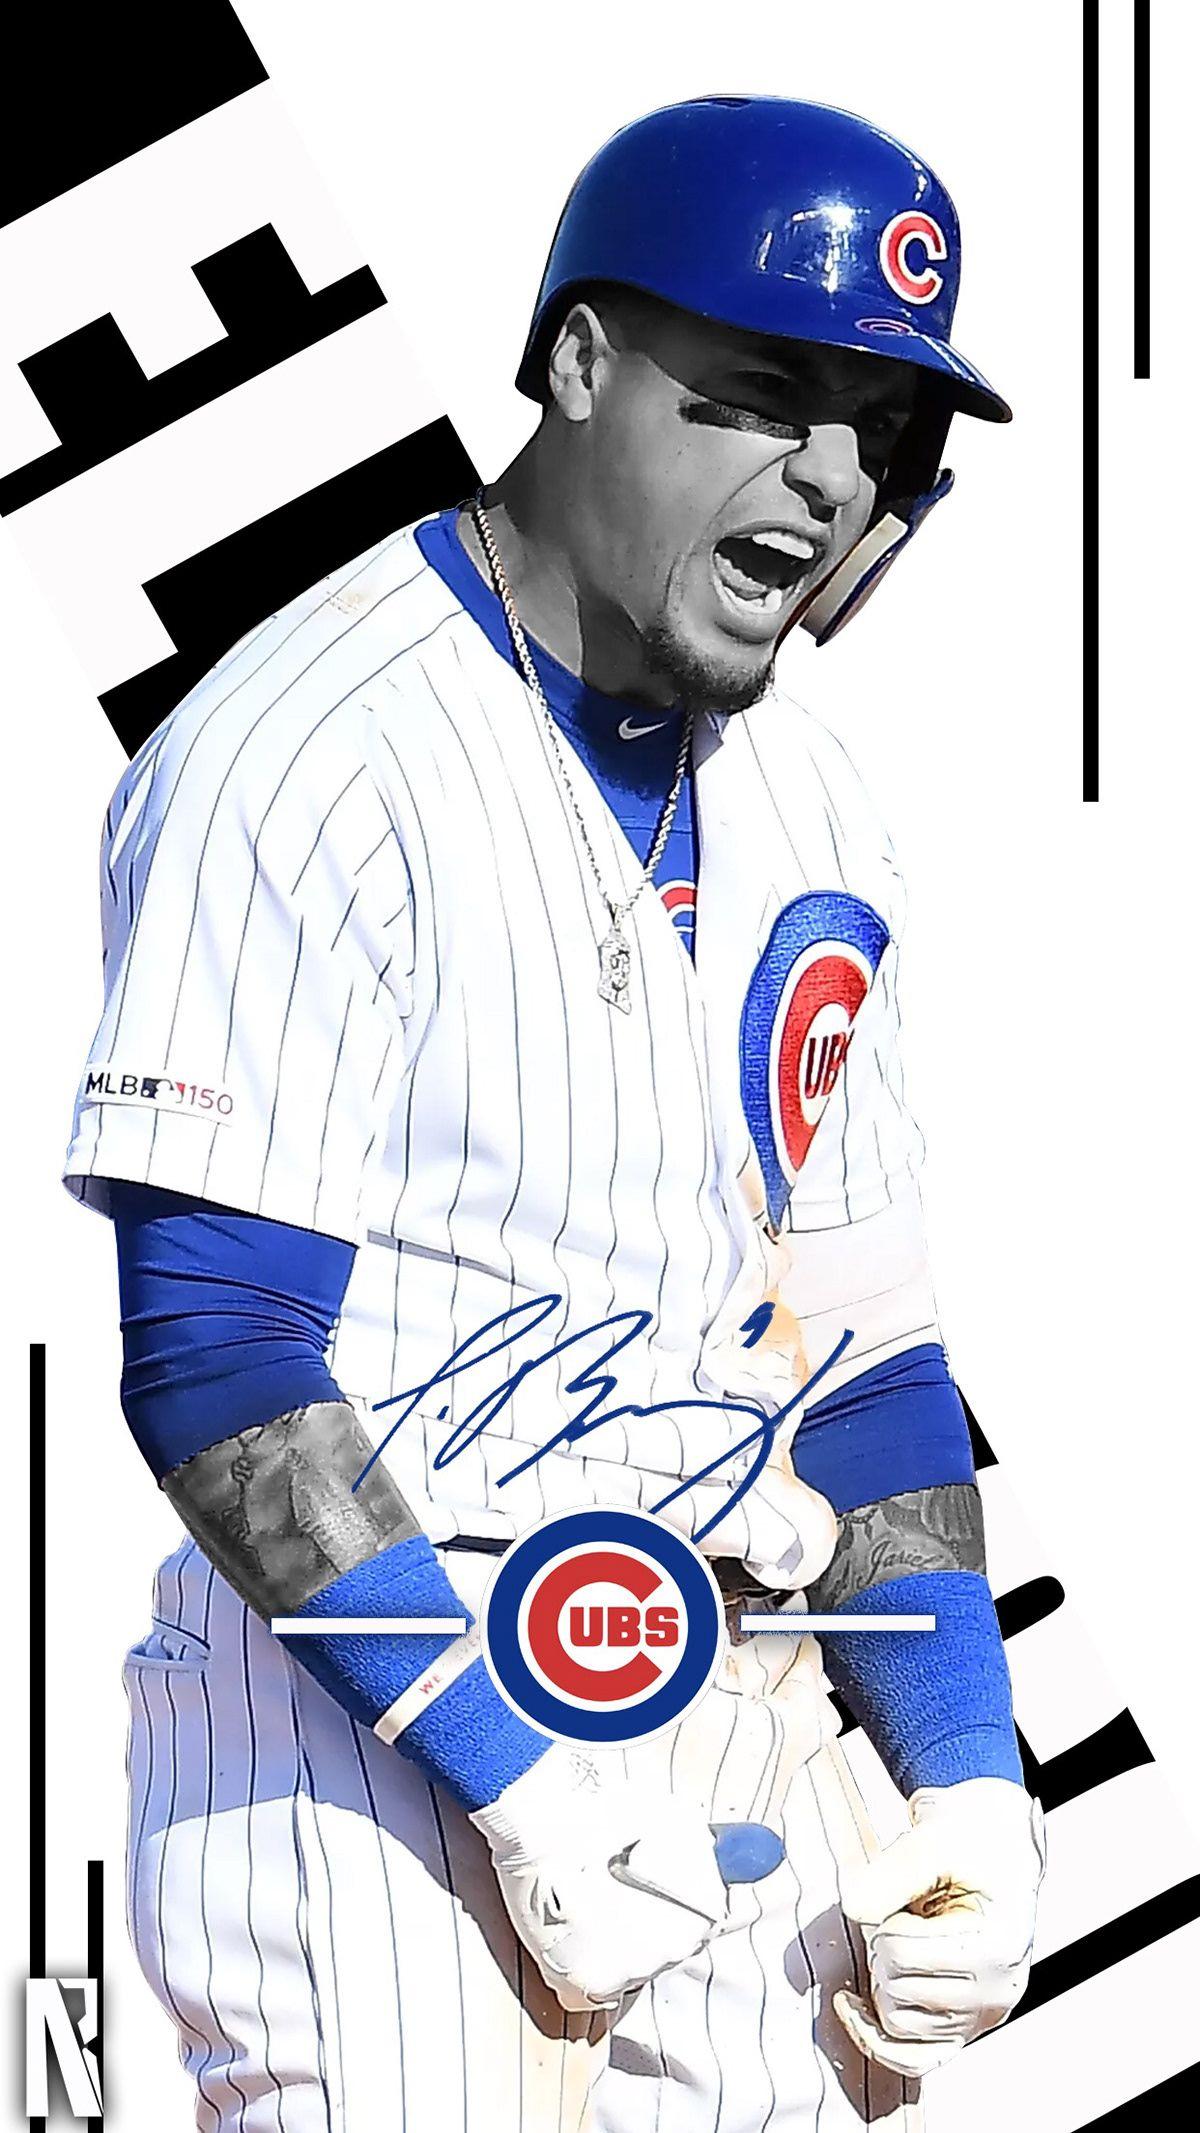 Mlb Edits On Behance Chicago Cubs Wallpaper Mlb Baseball Players Rockies Baseball